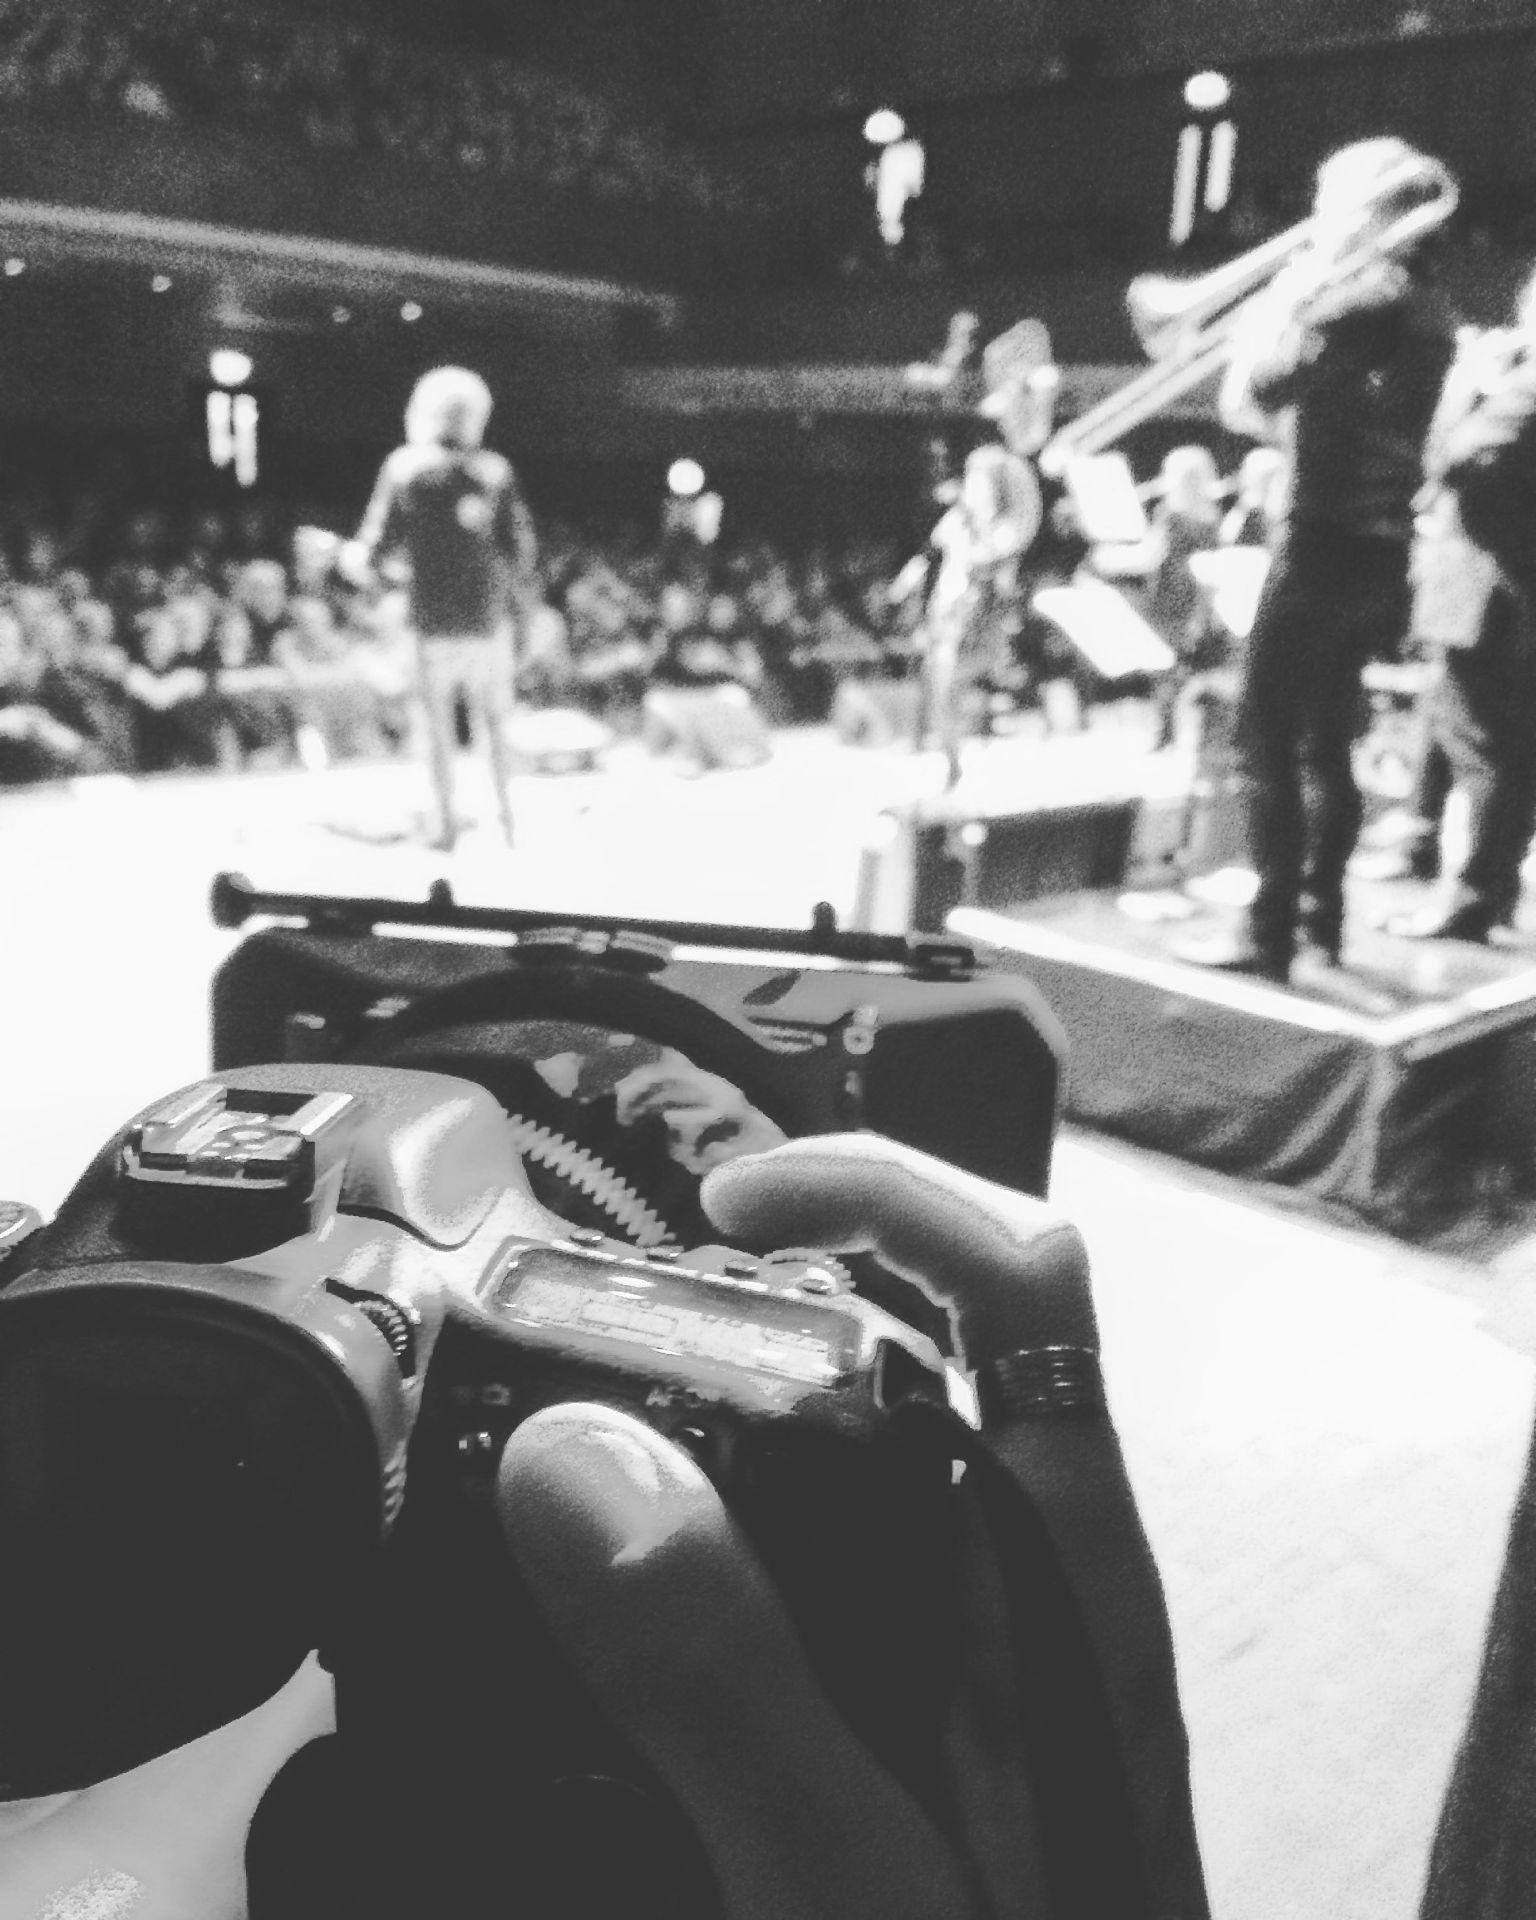 Spike Edney's SAS Band: Onstage